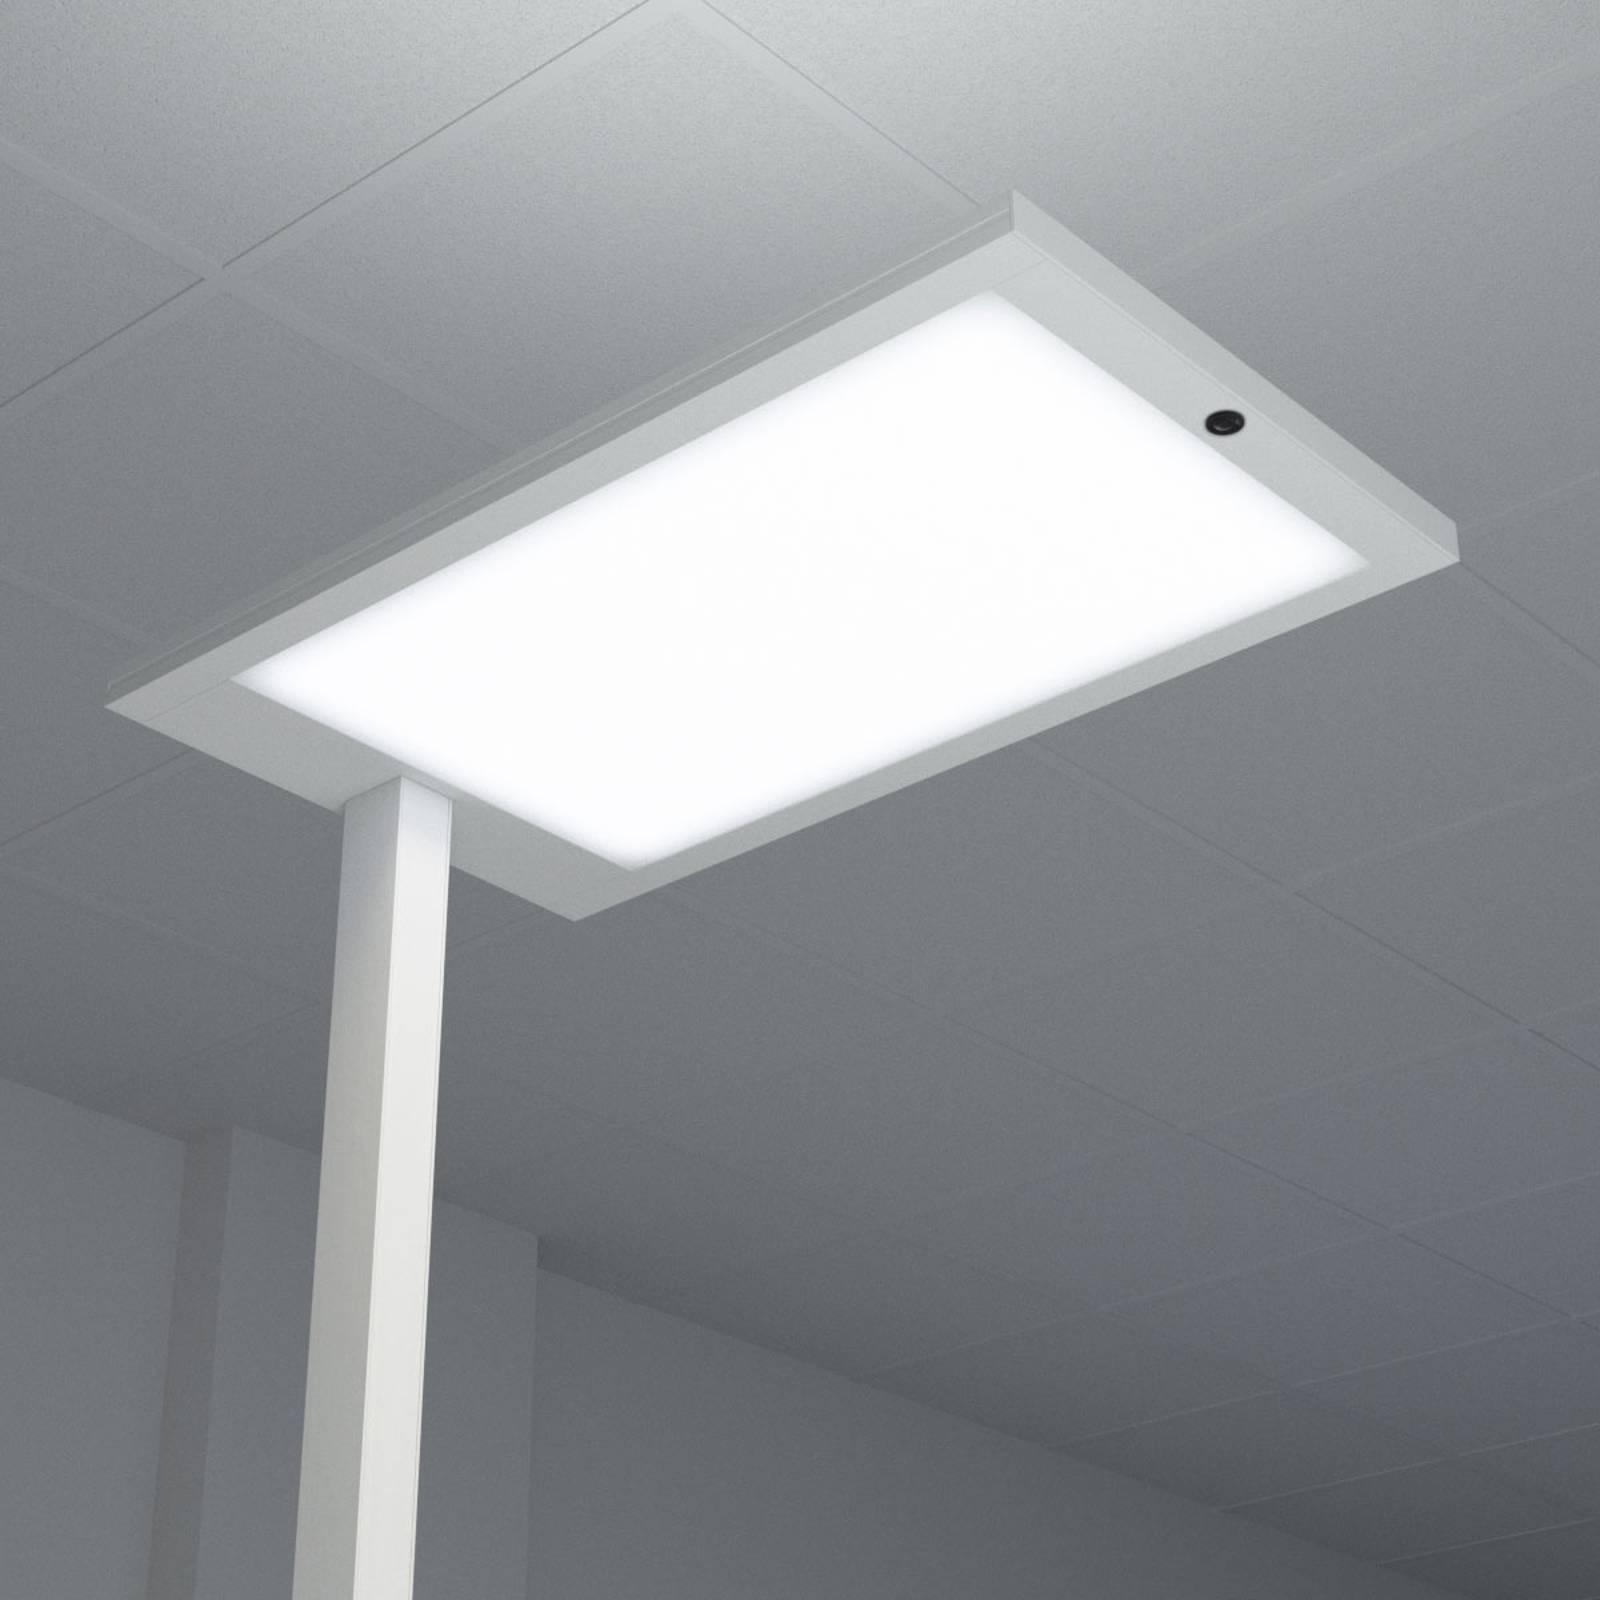 Biurowa lampa stojąca LED Almira, srebrna